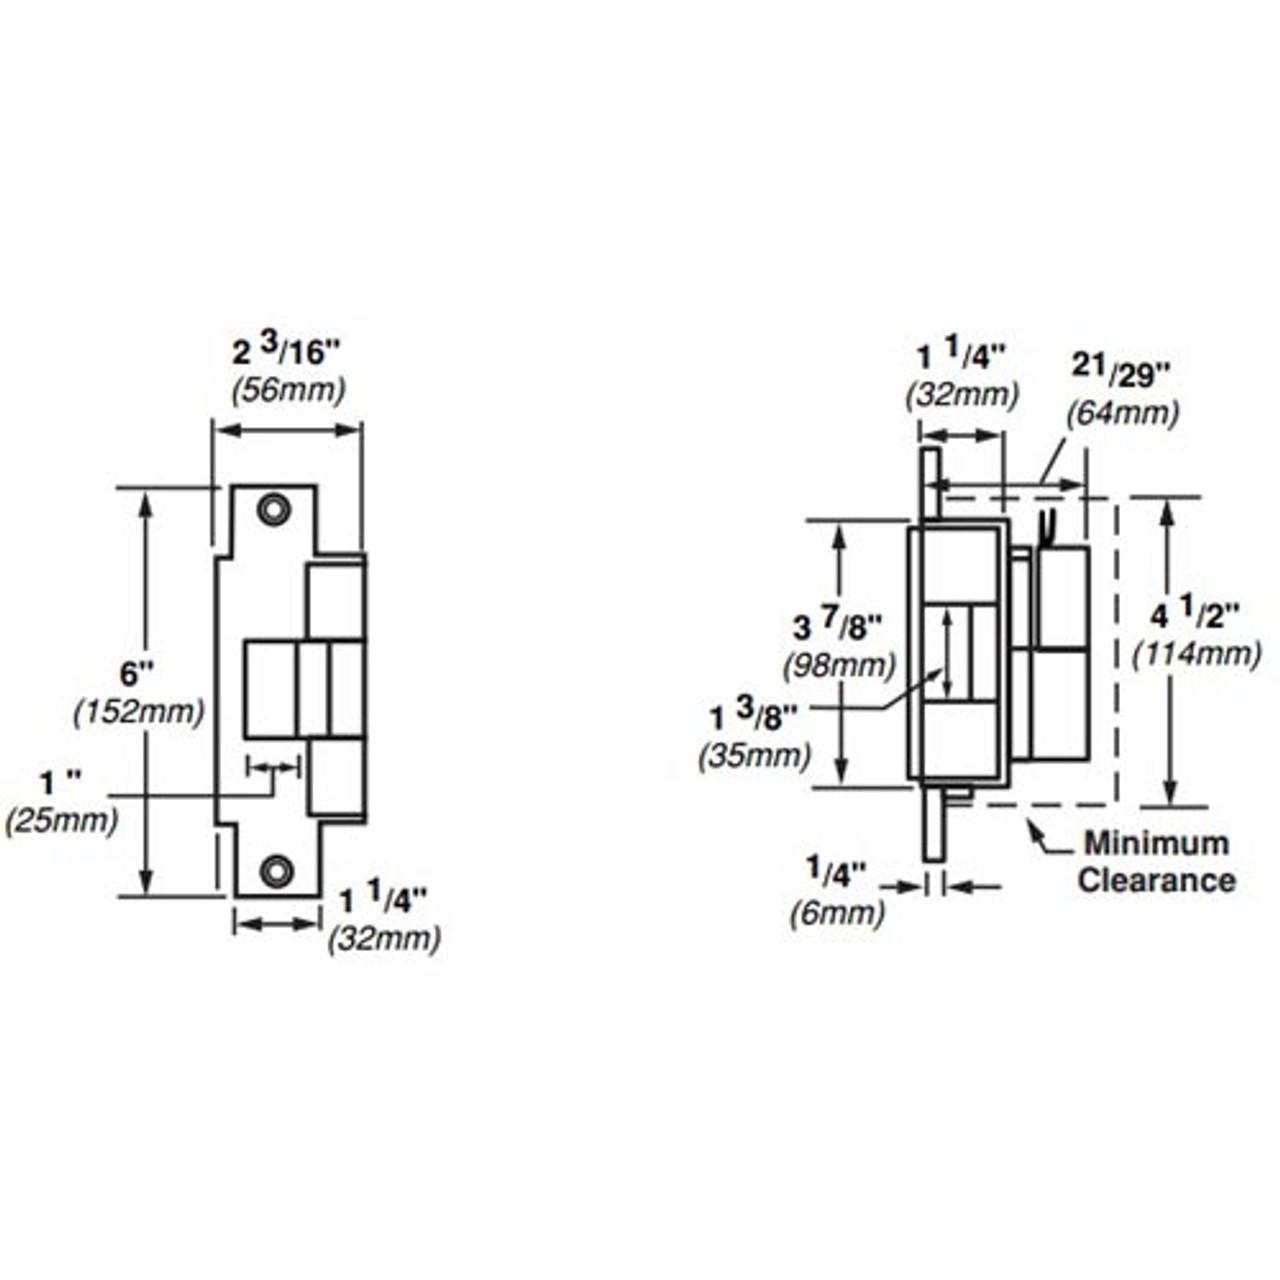 6213-FS-DS-12VDC-US4 Von Duprin Electric Strike for Mortise or Cylindrical Locksets in Satin Brass Finish